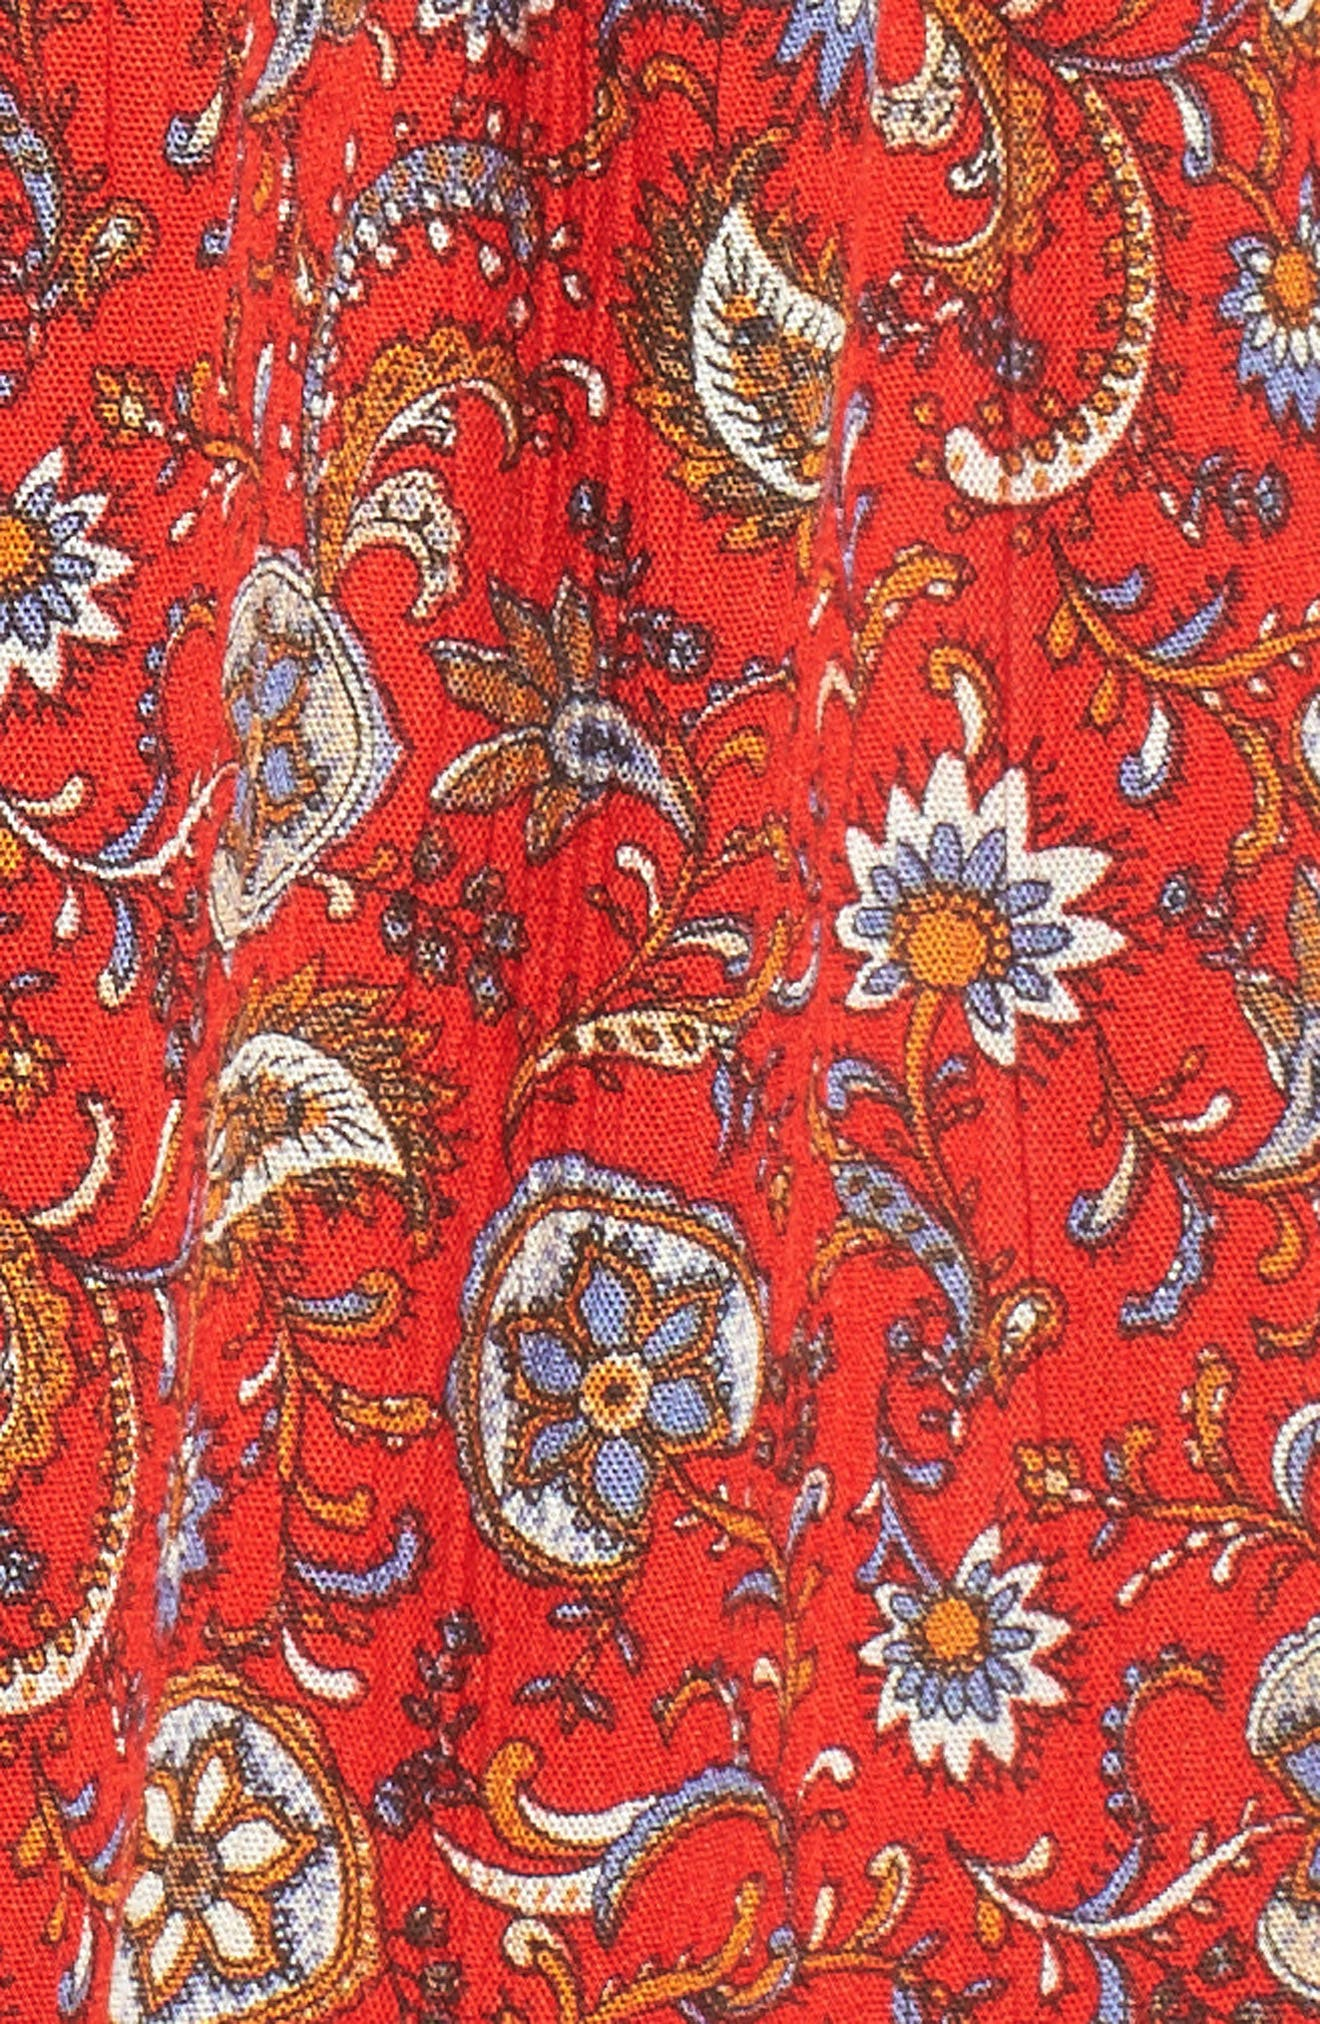 Floral Print High/Low Peasant Blouse,                             Alternate thumbnail 15, color,